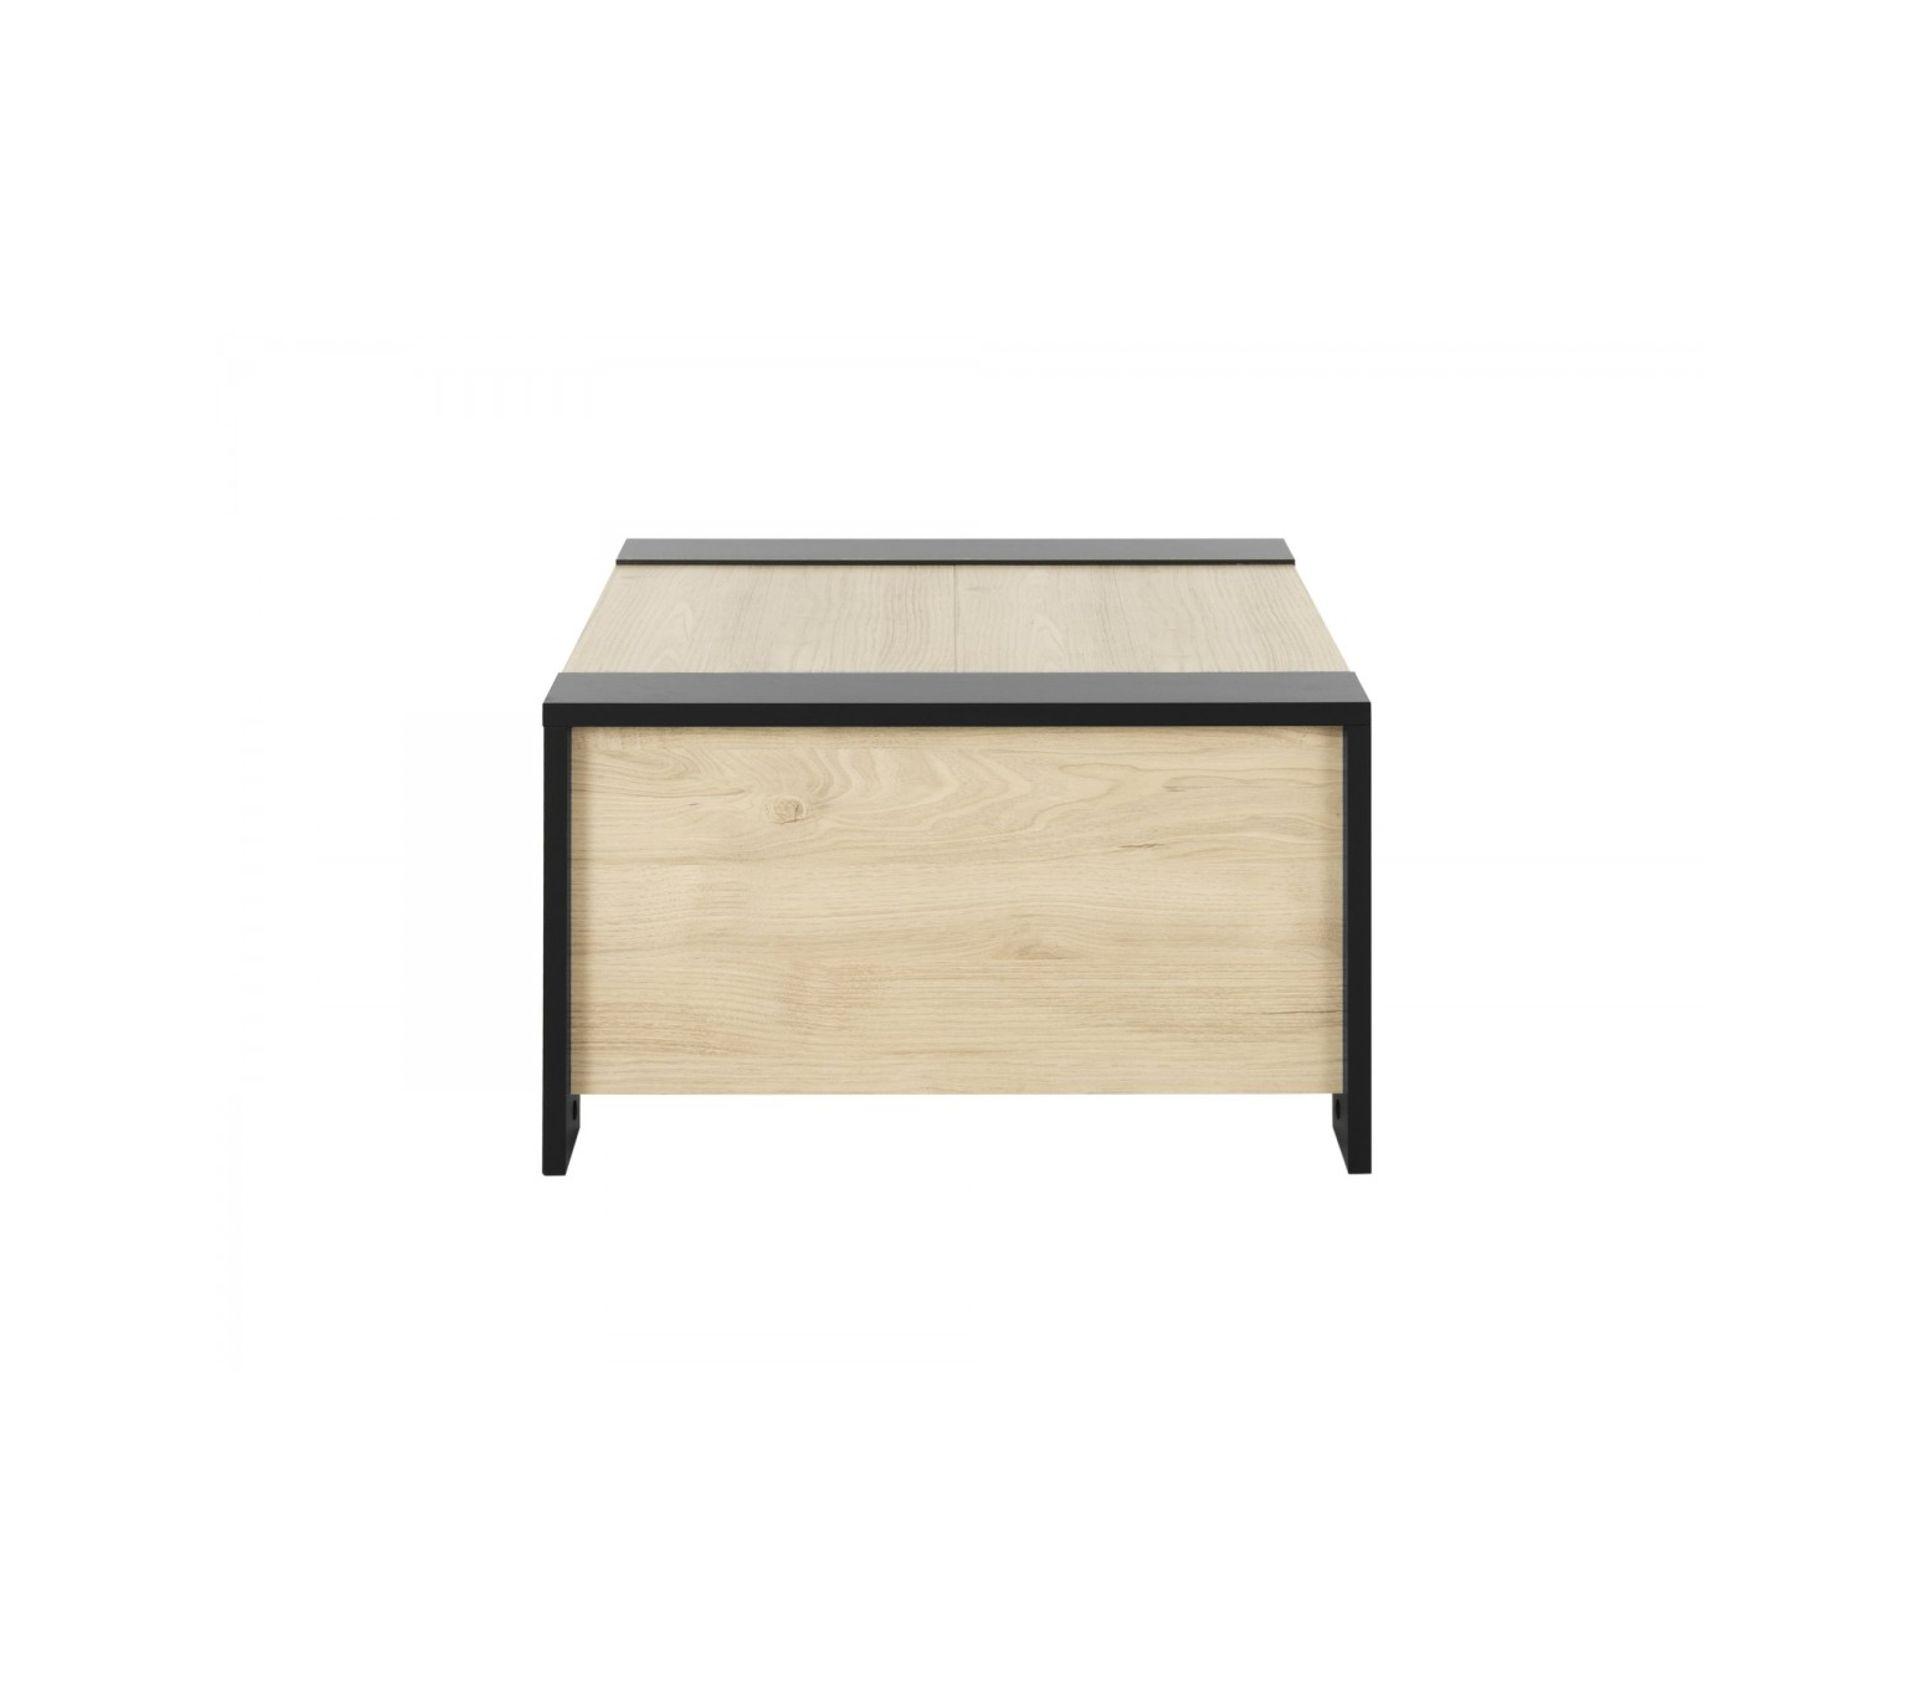 Table Basse Avec Rangement Bar Aurora Fabrication Francaise Table Basse But